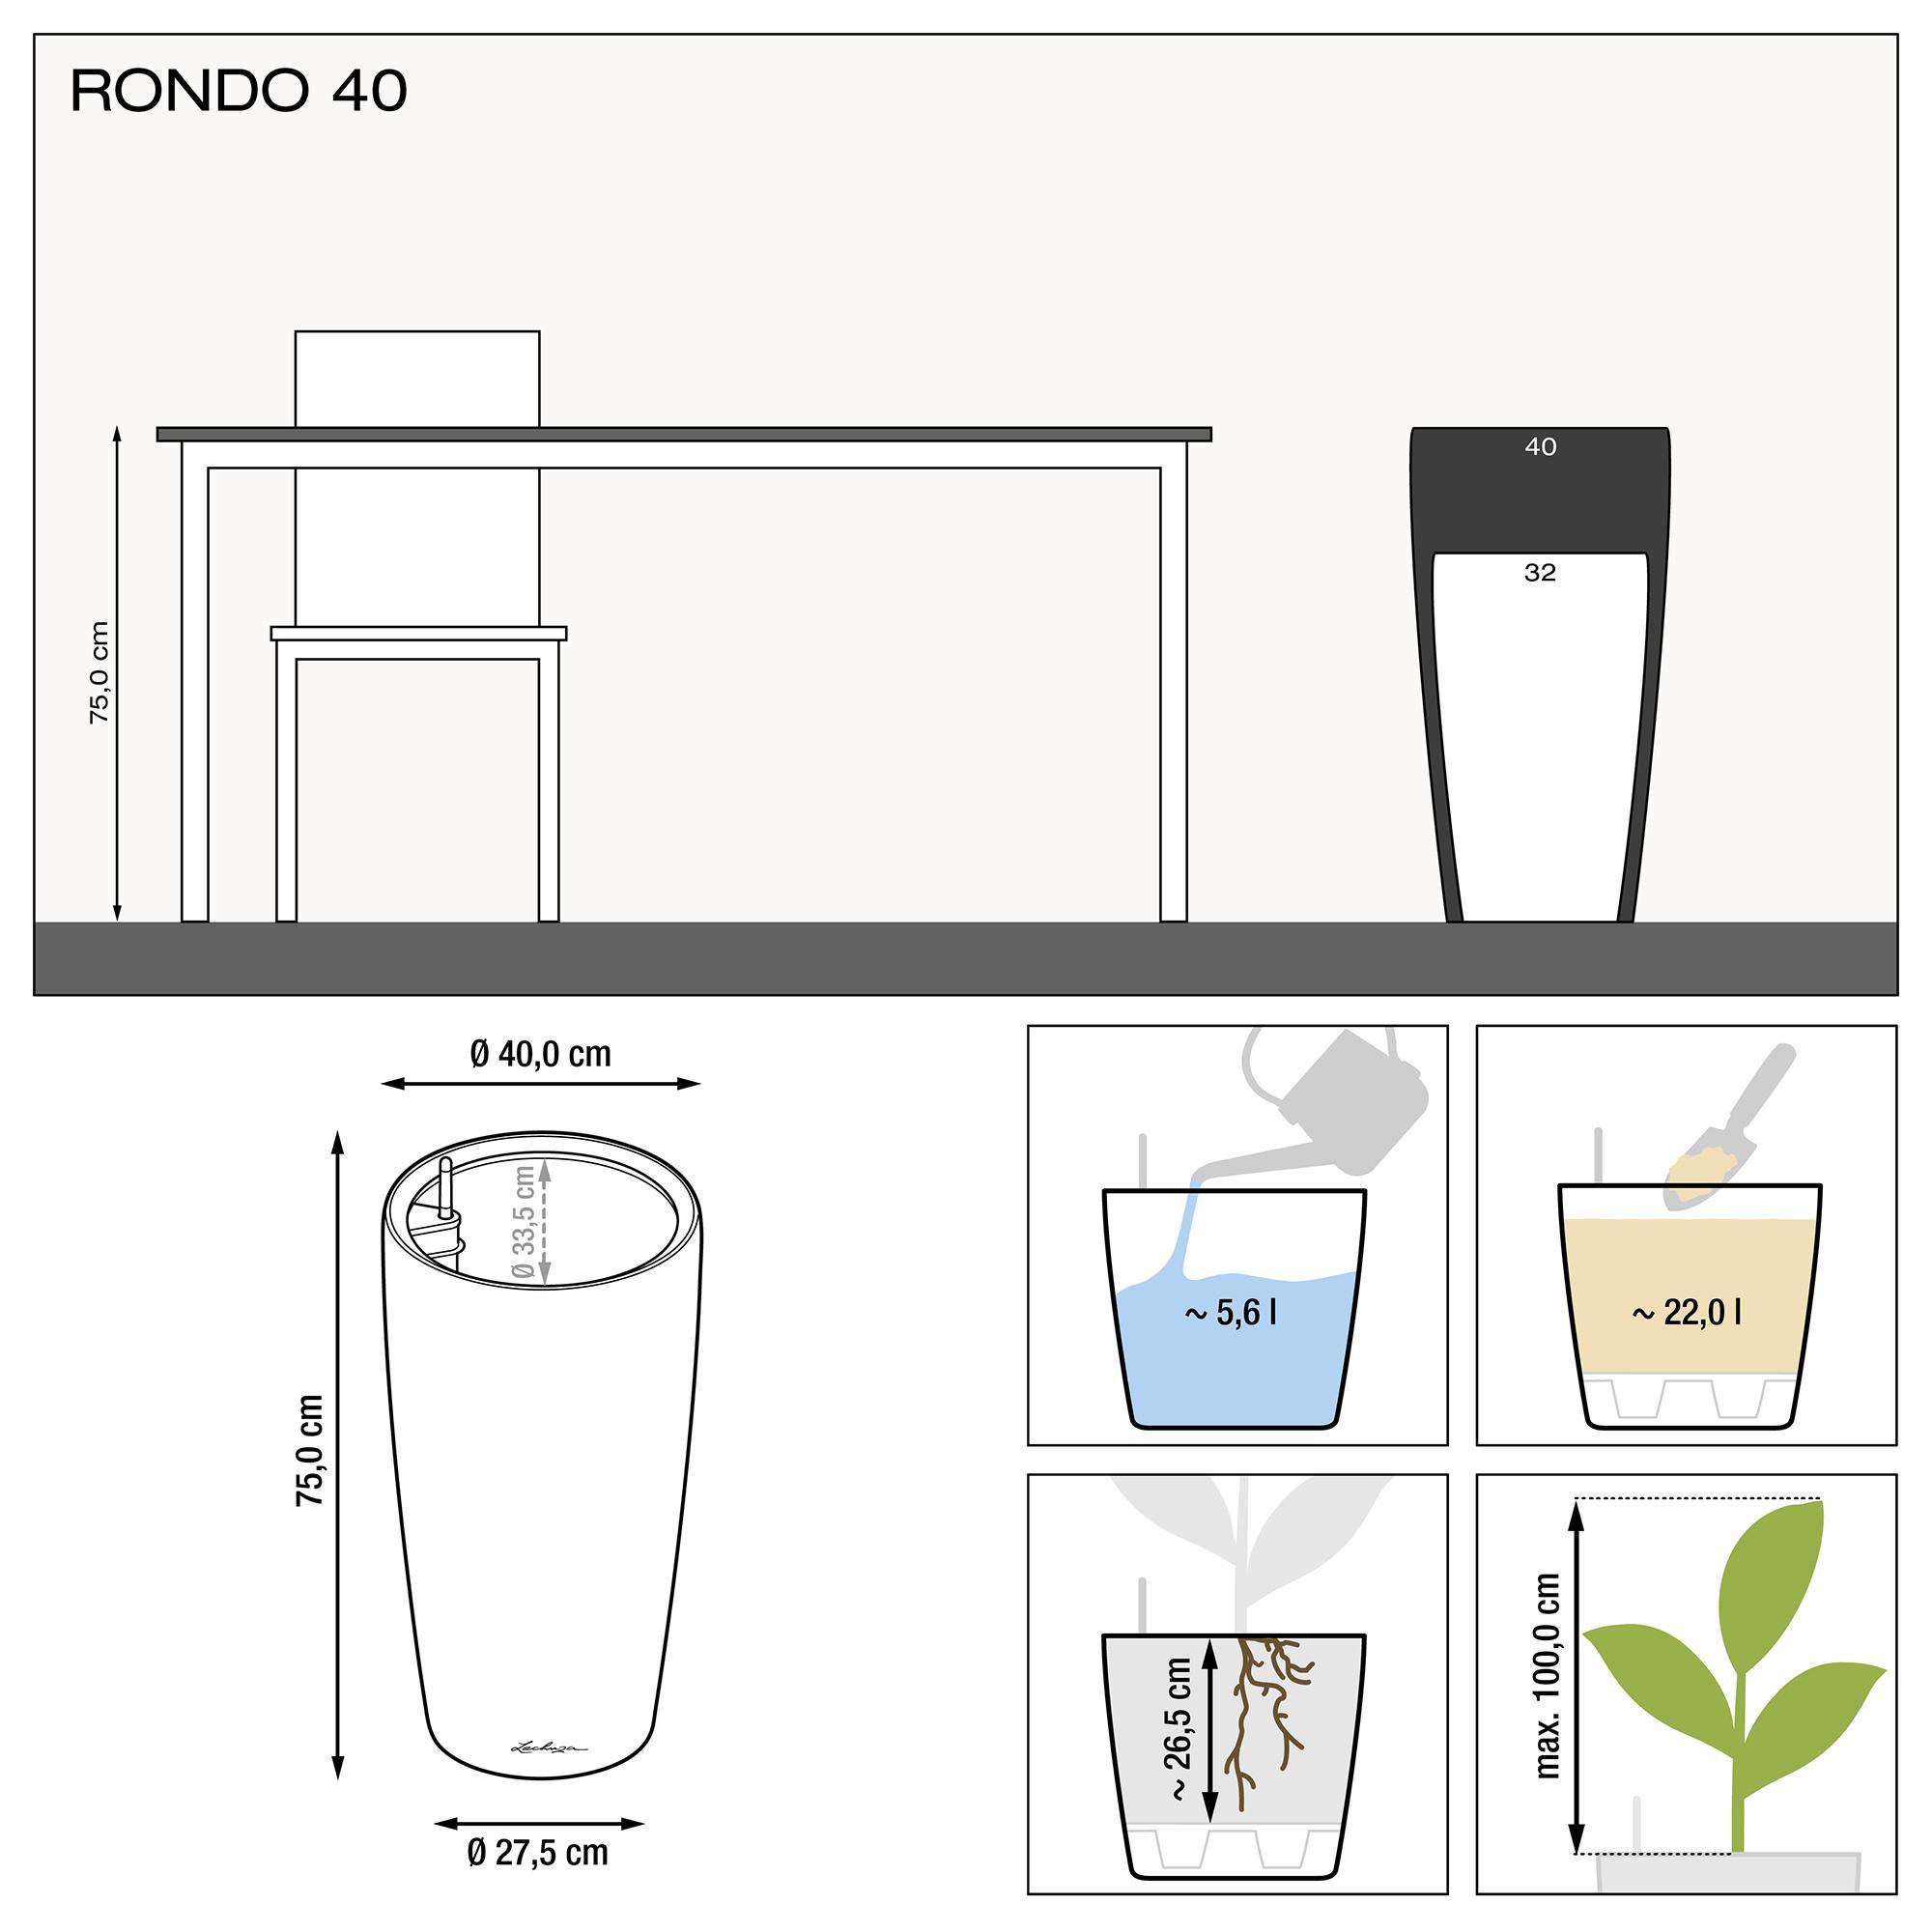 small resolution of le rondo40 product addi nz le rondo40 product addi 01 le rondo40 product addi 02 le rondo product addi 01 le rondo product addi 02